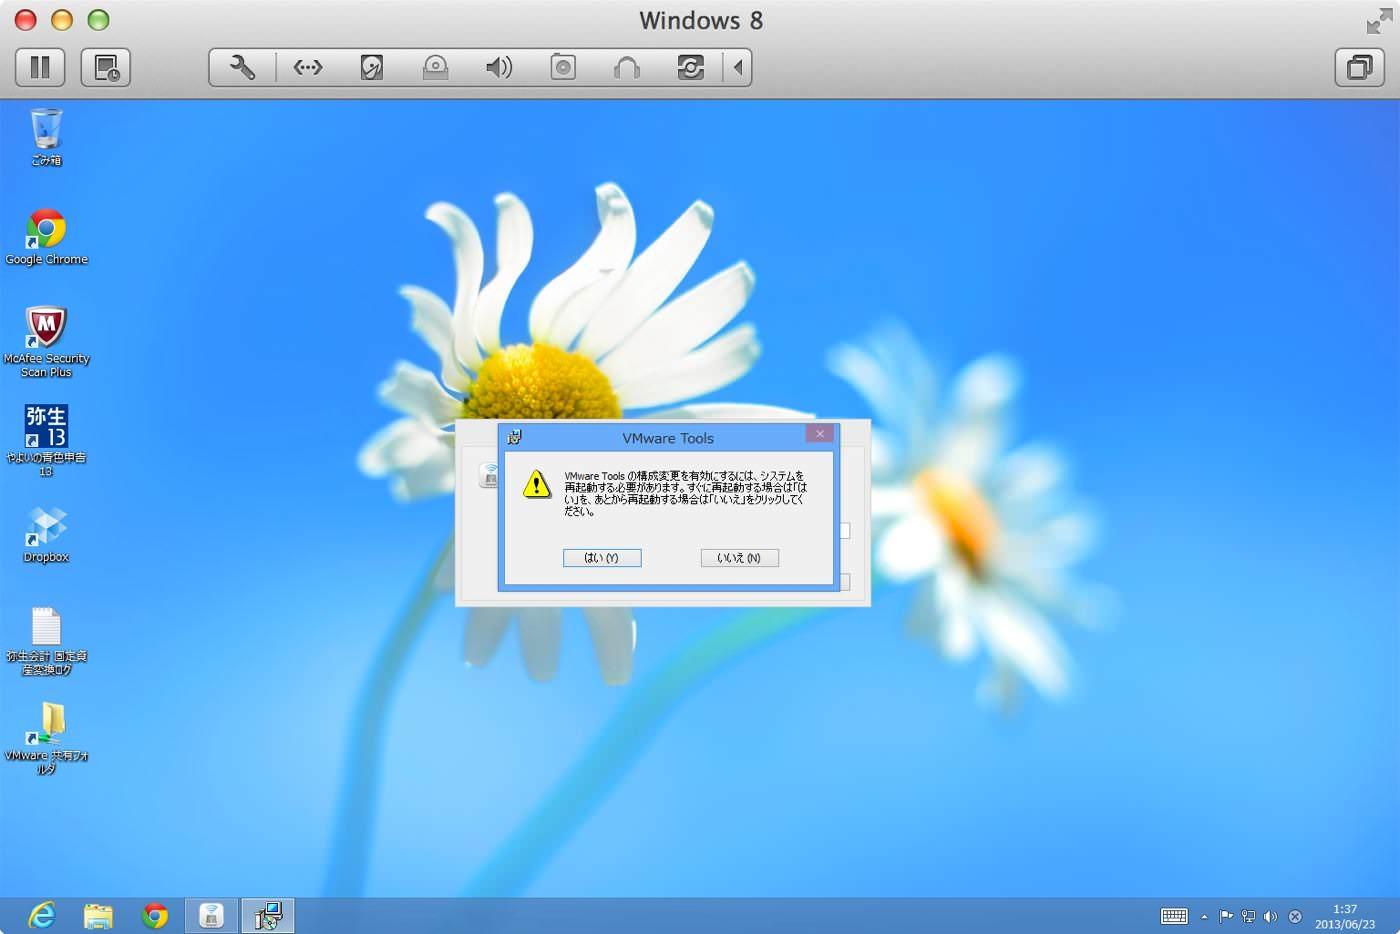 Vmware toolsの再起動アラート